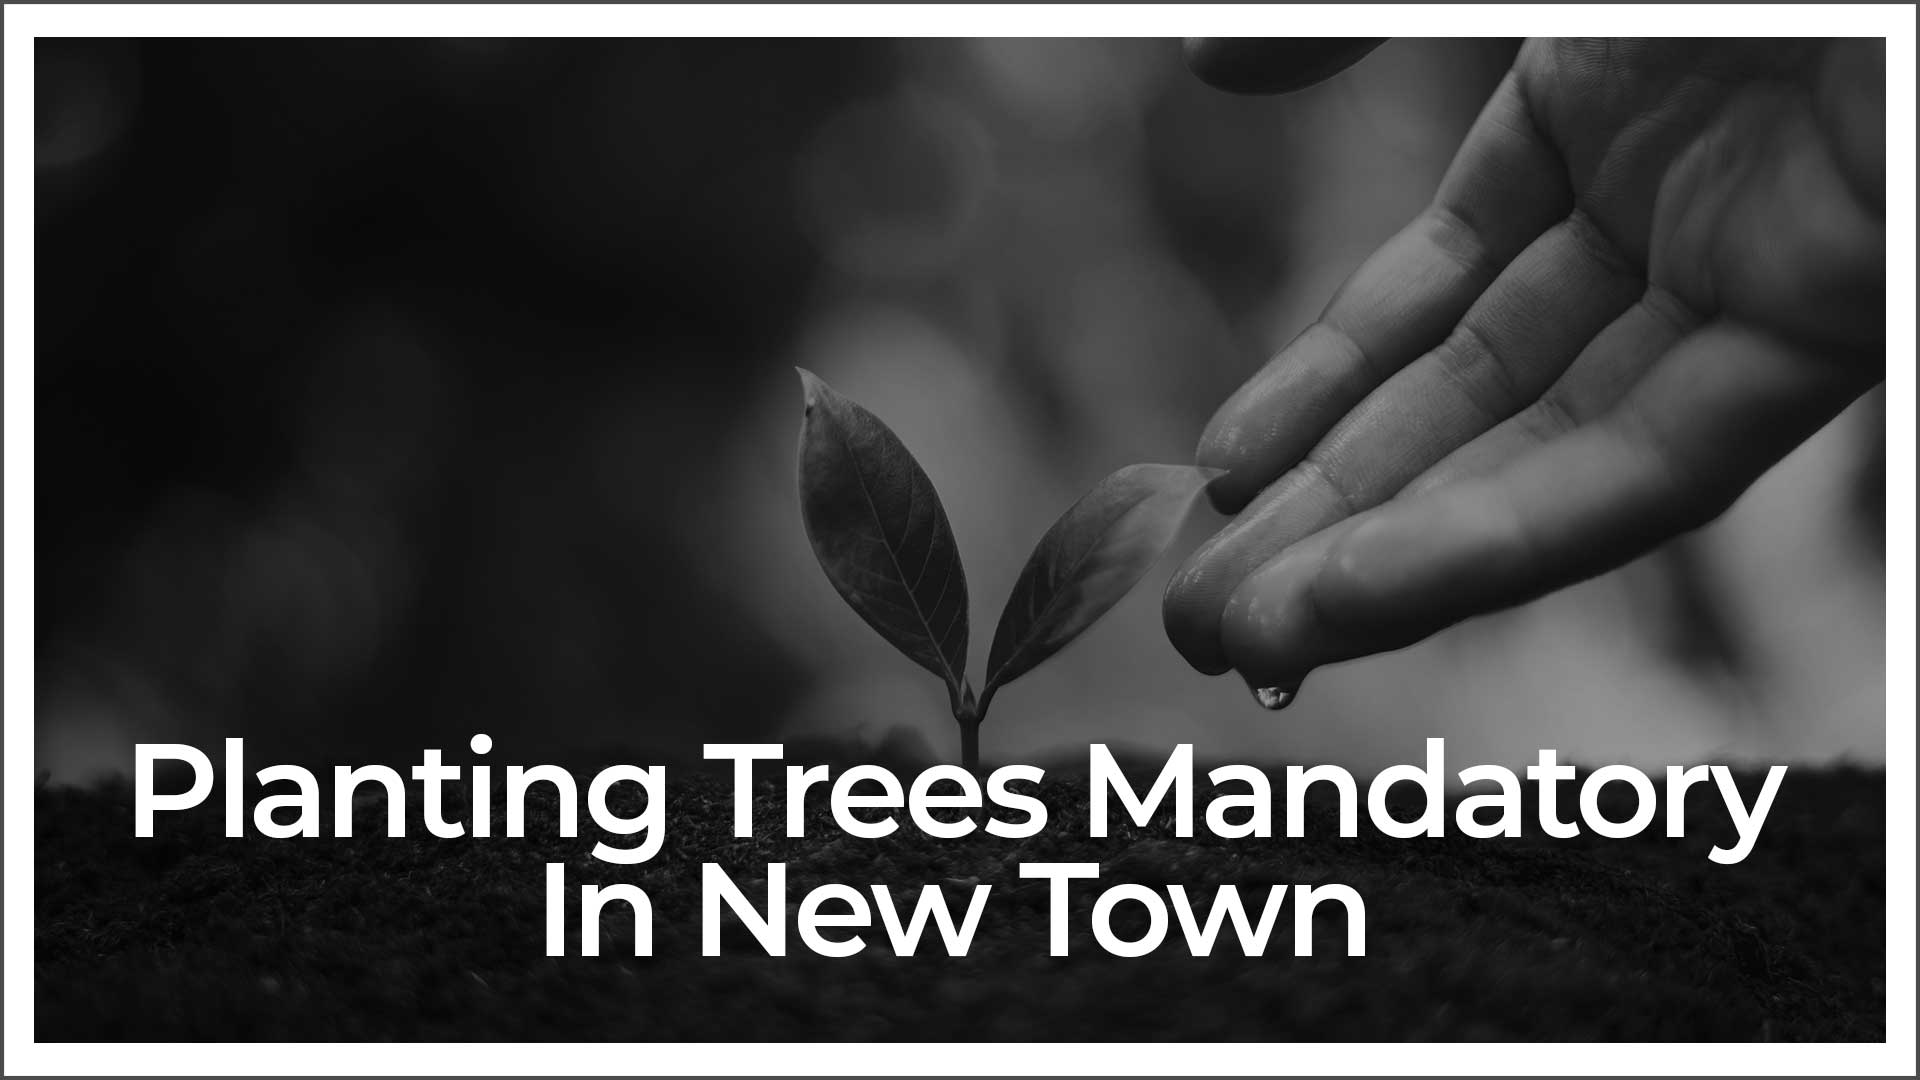 NKDA Makes It Mandatory To Plant Trees